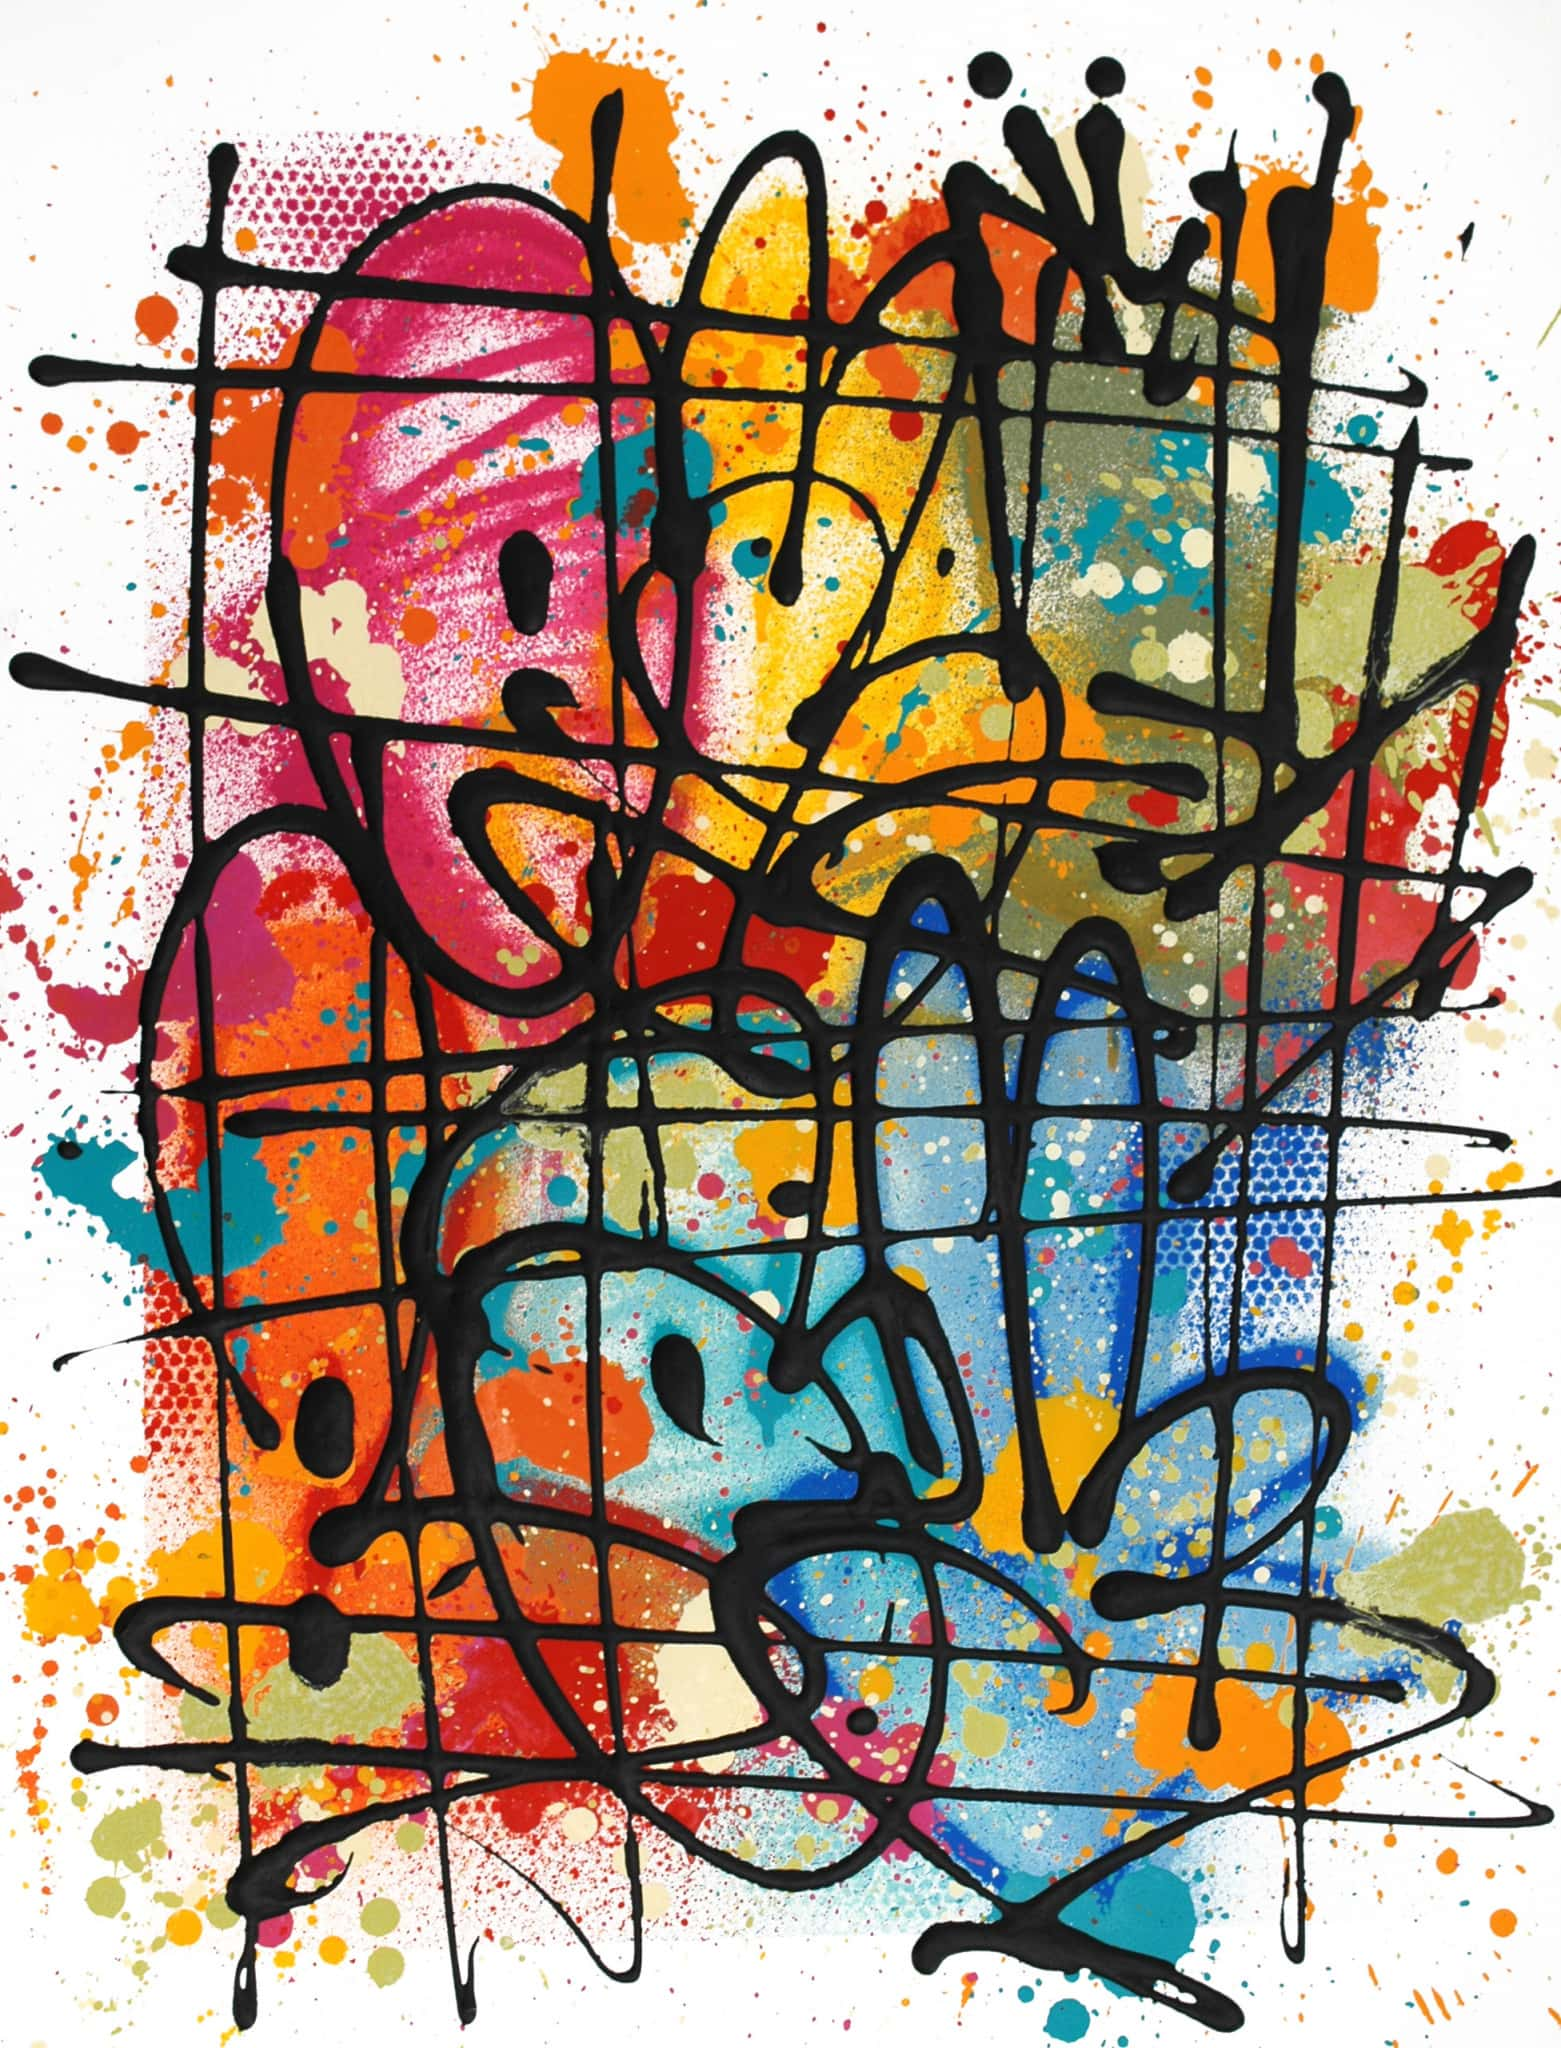 Galerie Art Jingle NEBAY (Réf. NB05) 65x50 cm 2021